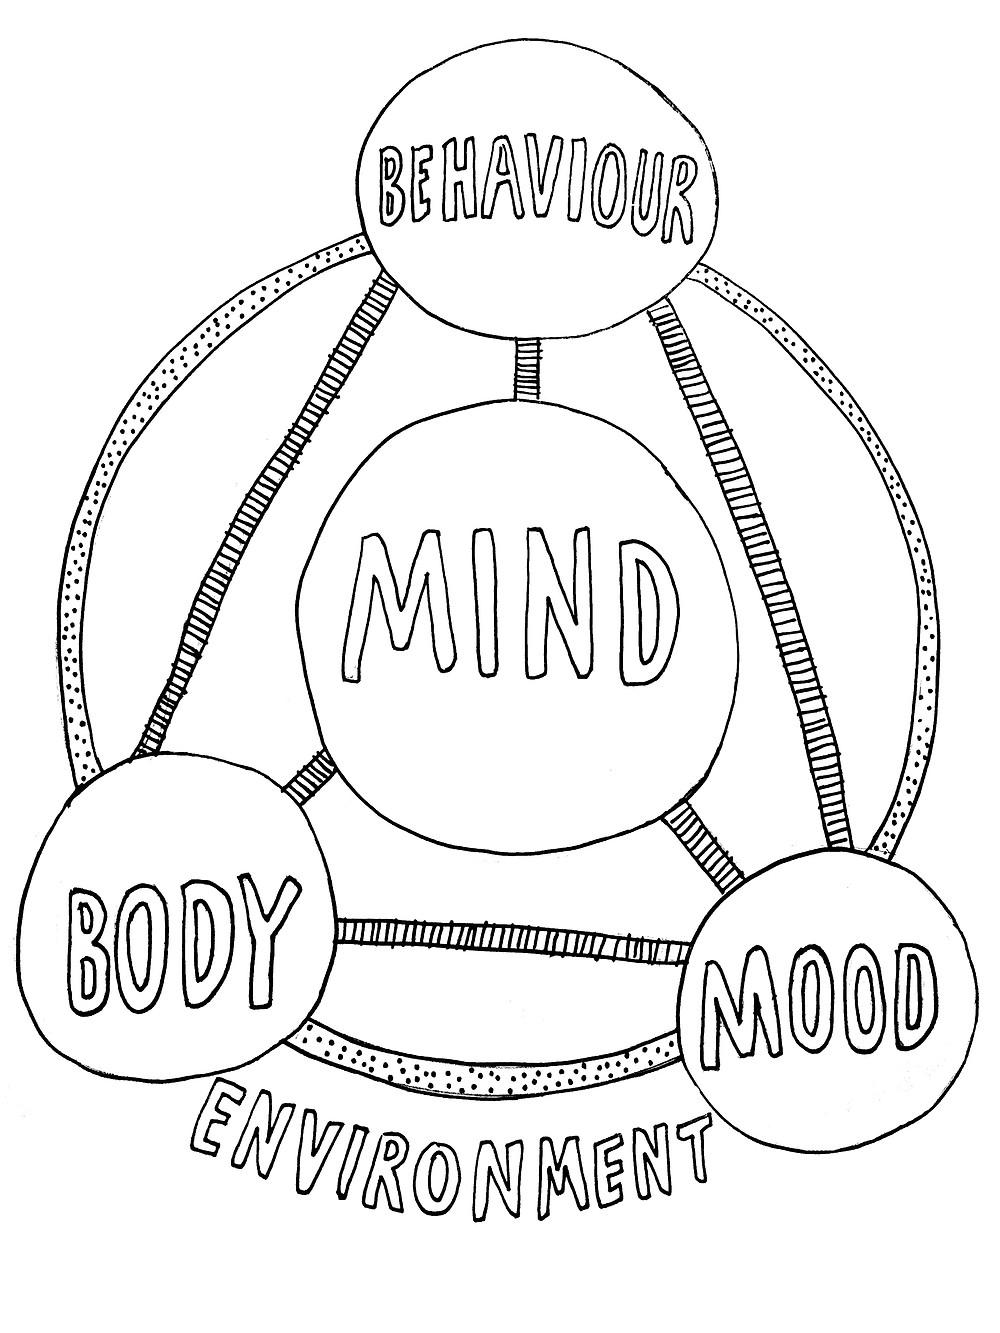 body mood environment mind behavviour